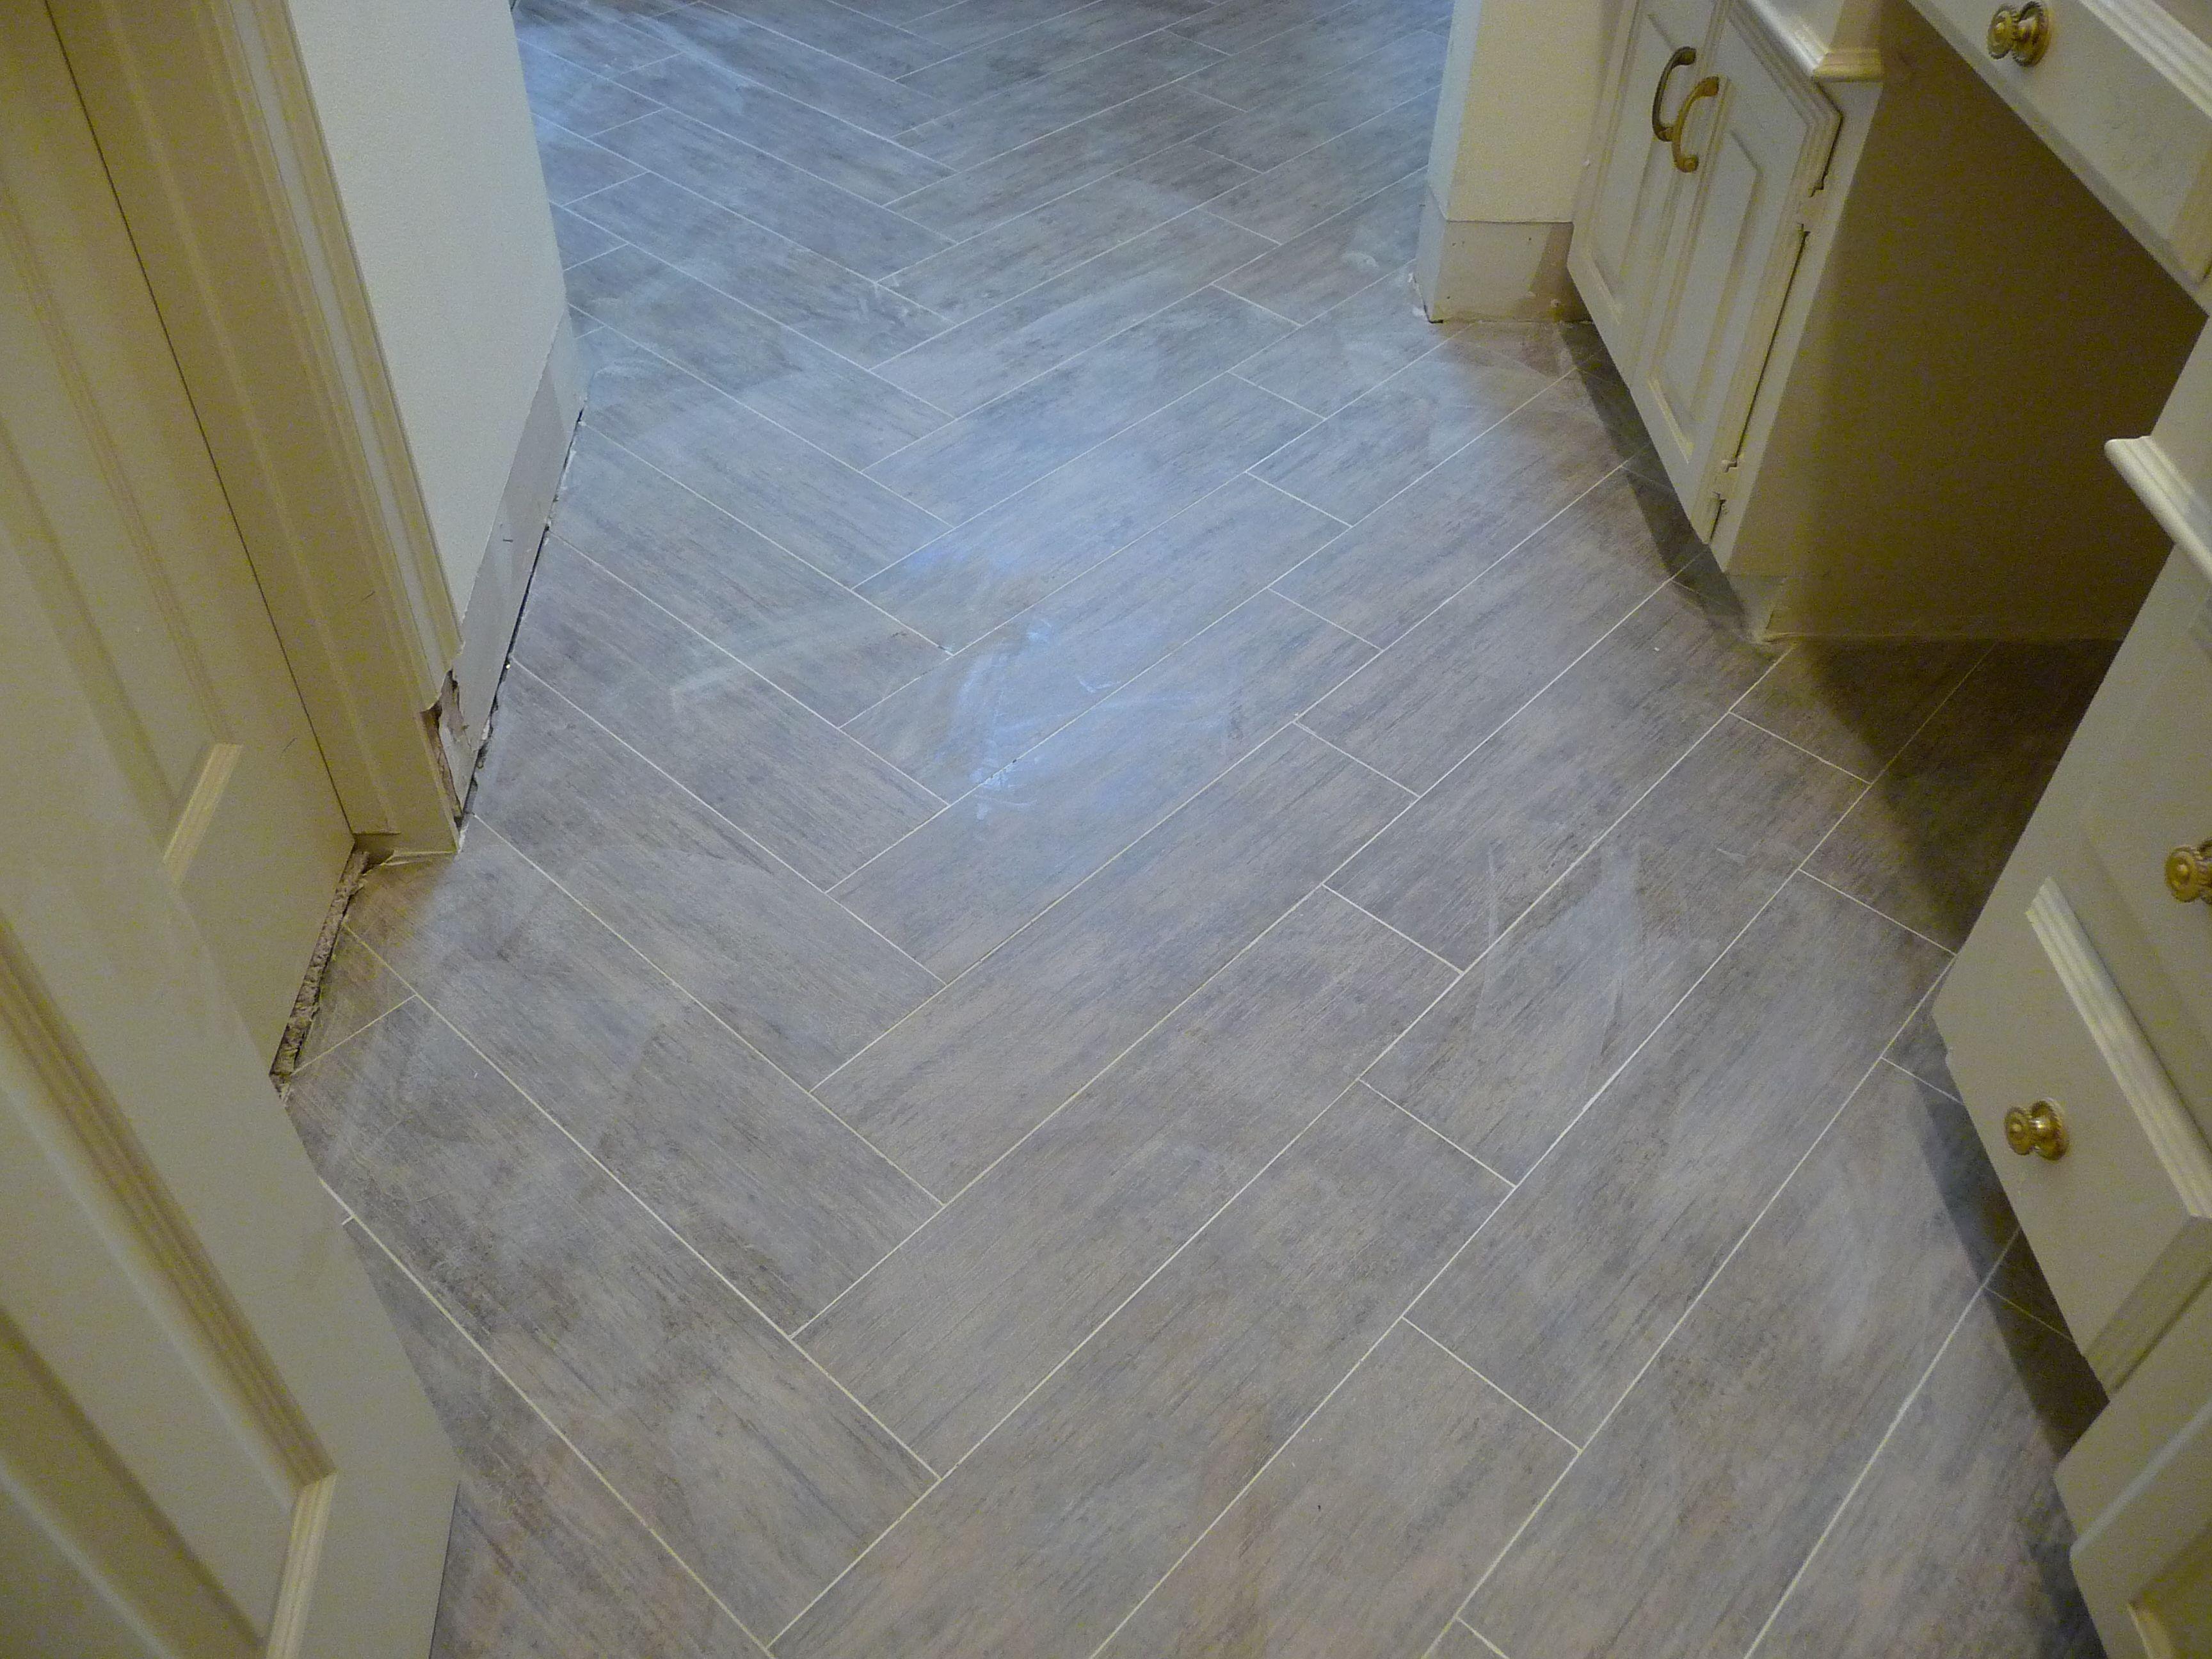 floor tile layout patterns 6 x 24